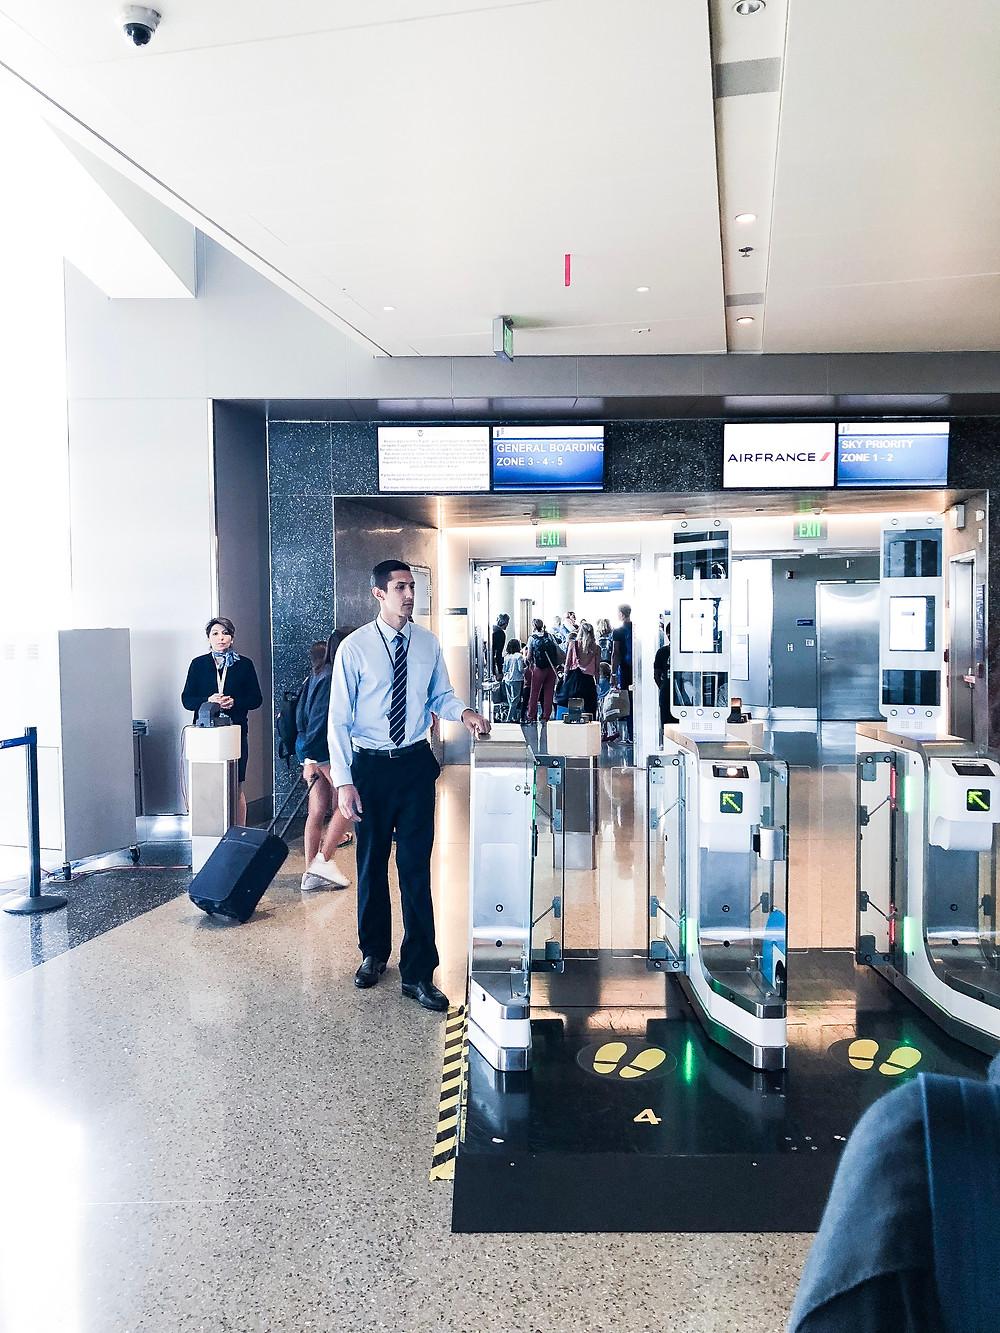 LAX Biometric Boarding Scanners